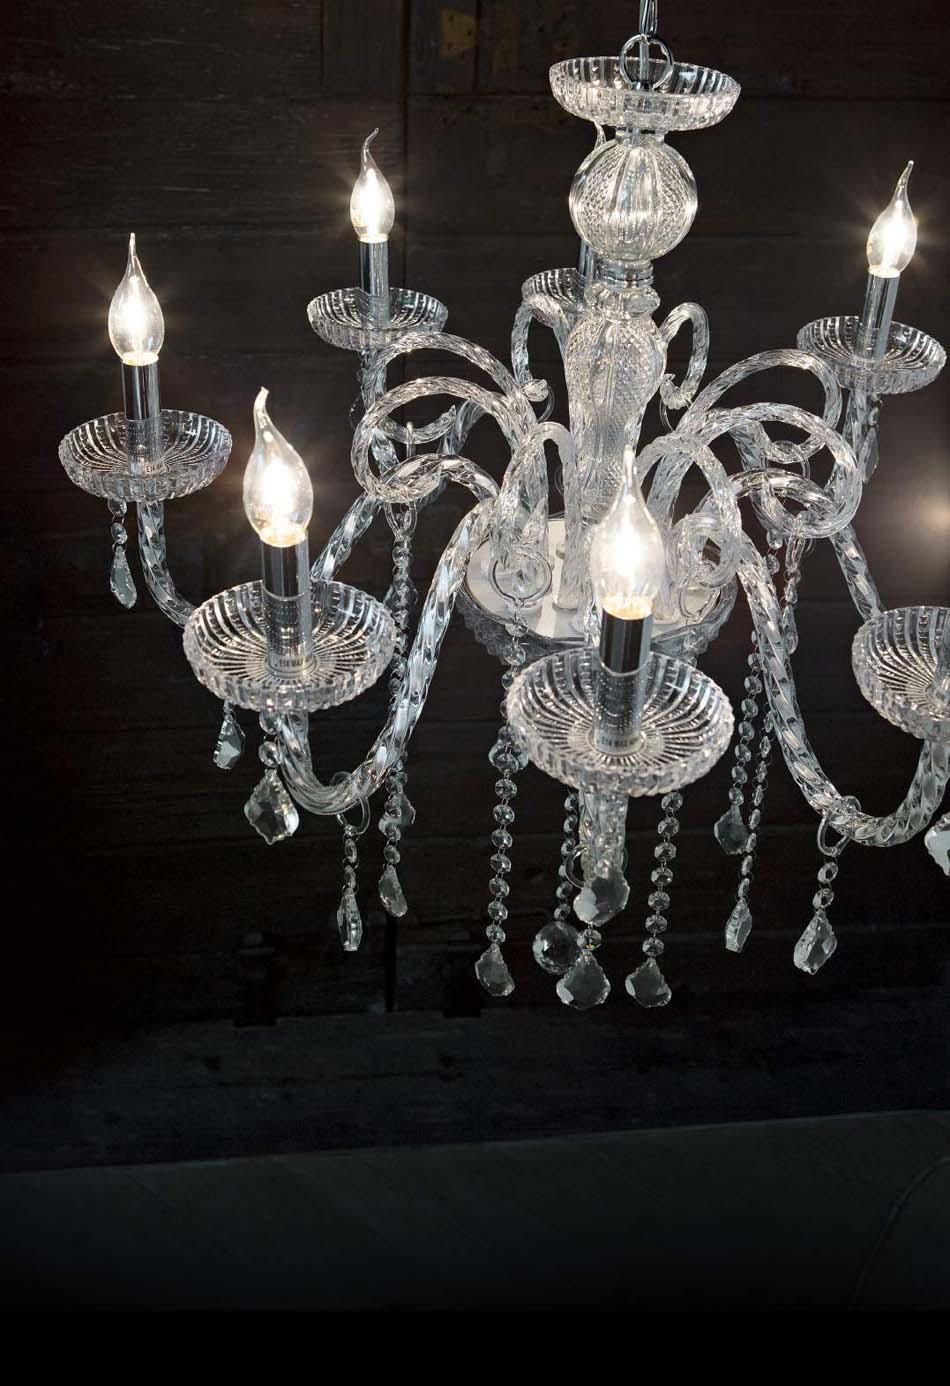 Lampade 25 sospese vintage Ideal Lux Giudecca – Toscana Arredamenti